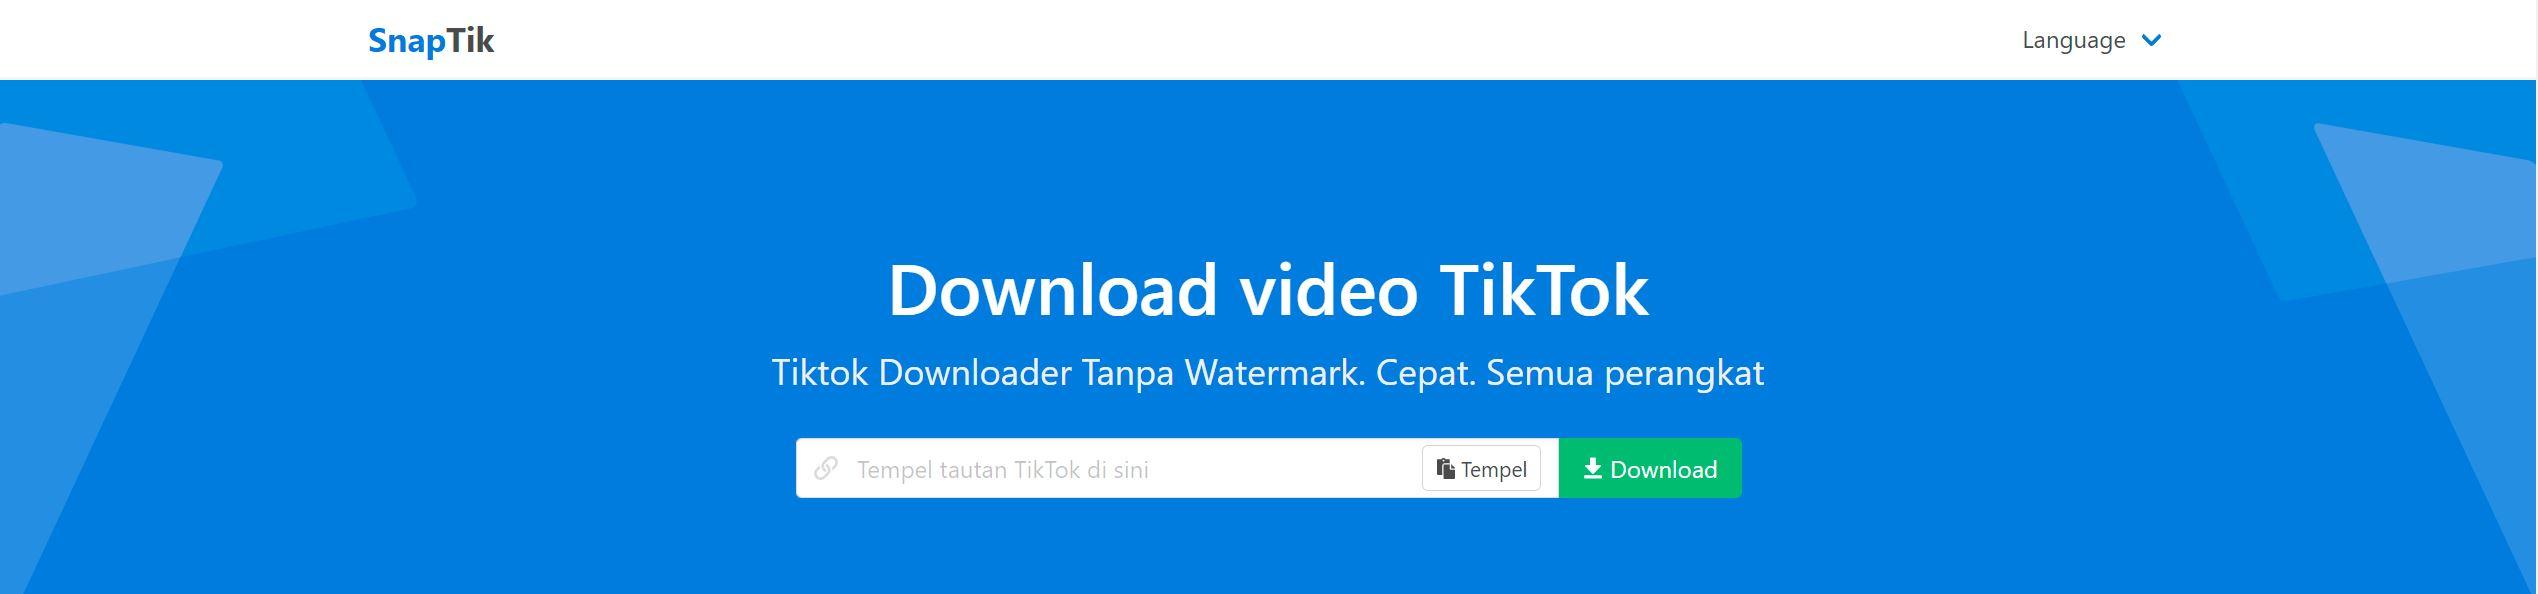 Cara Download Video TikTok & Facebook 4